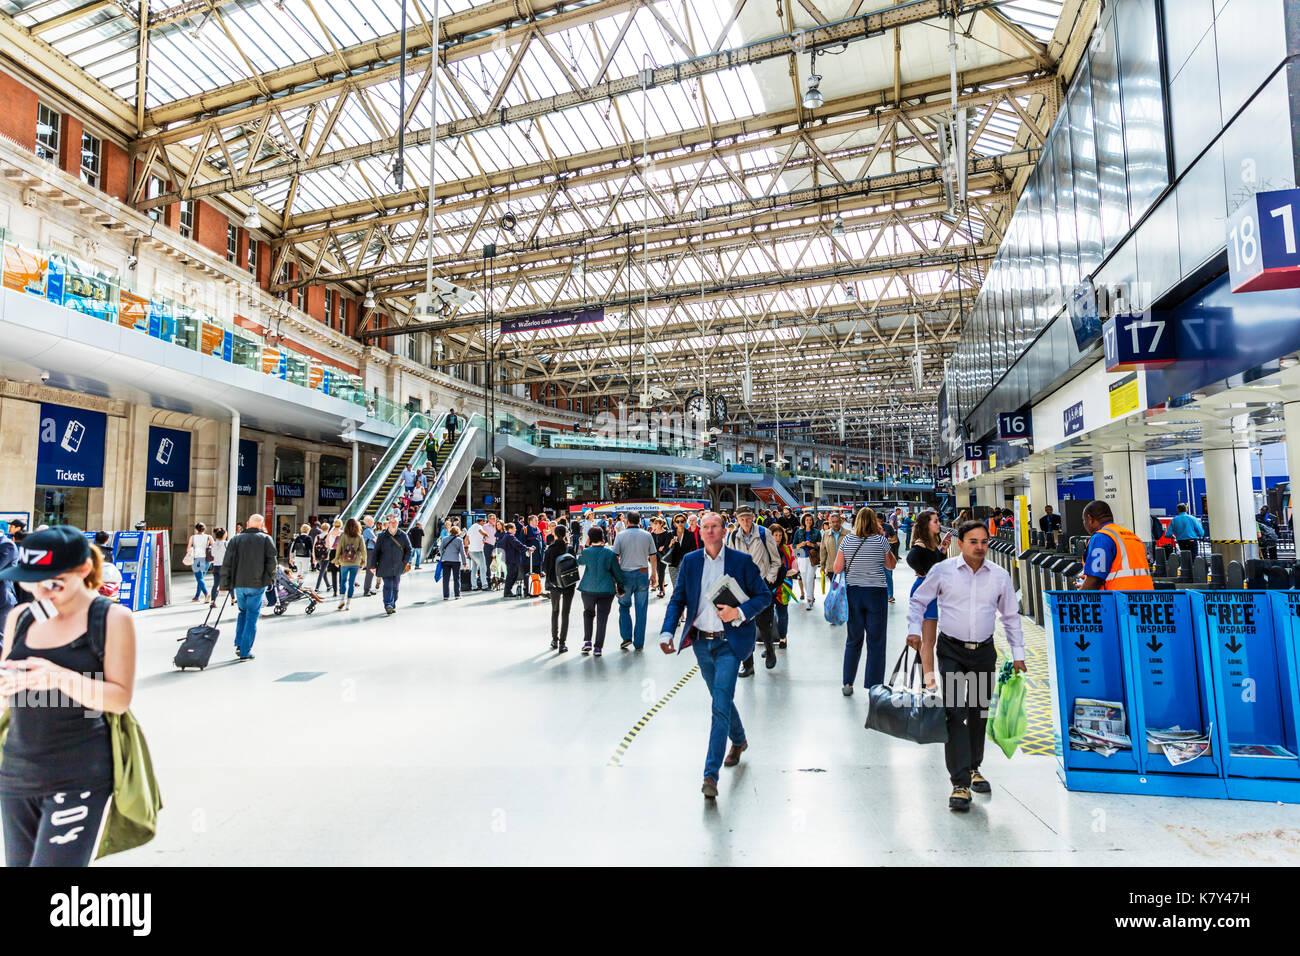 Waterloo Station London UK, Waterloo station, Waterloo Station interior, inside Waterloo Station, Waterloo train Station, Waterloo underground Station - Stock Image